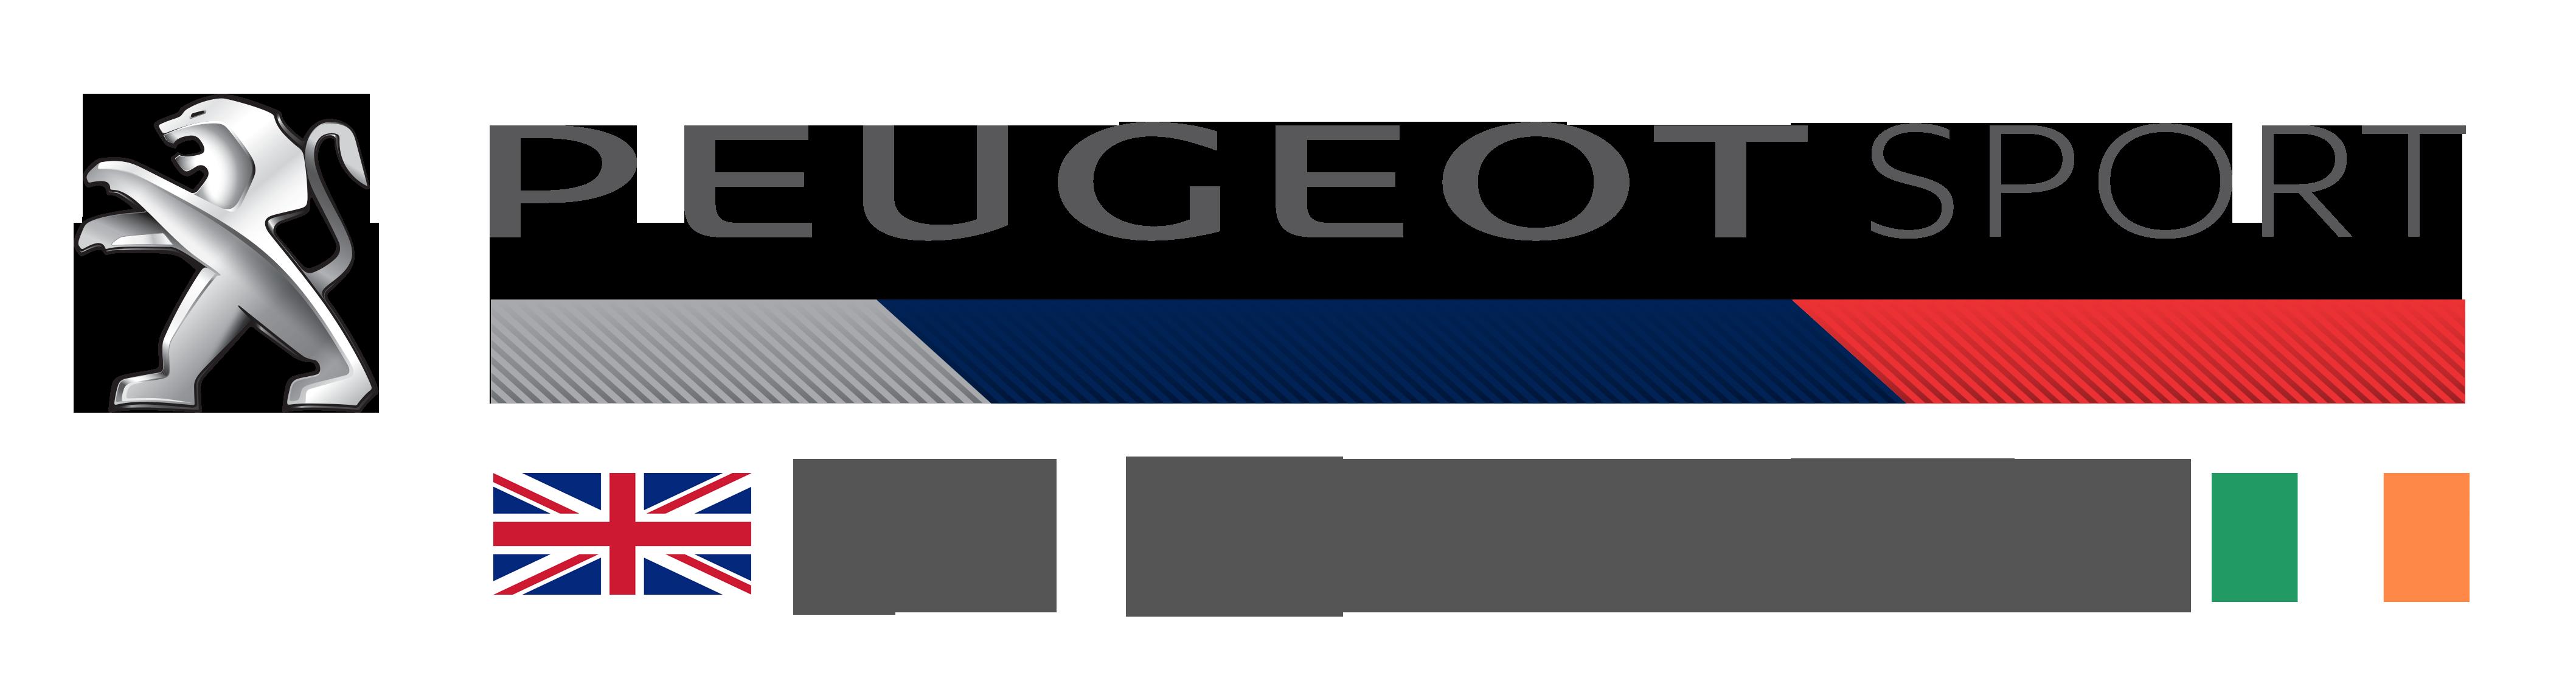 Peugeot Sport UK/Ireland